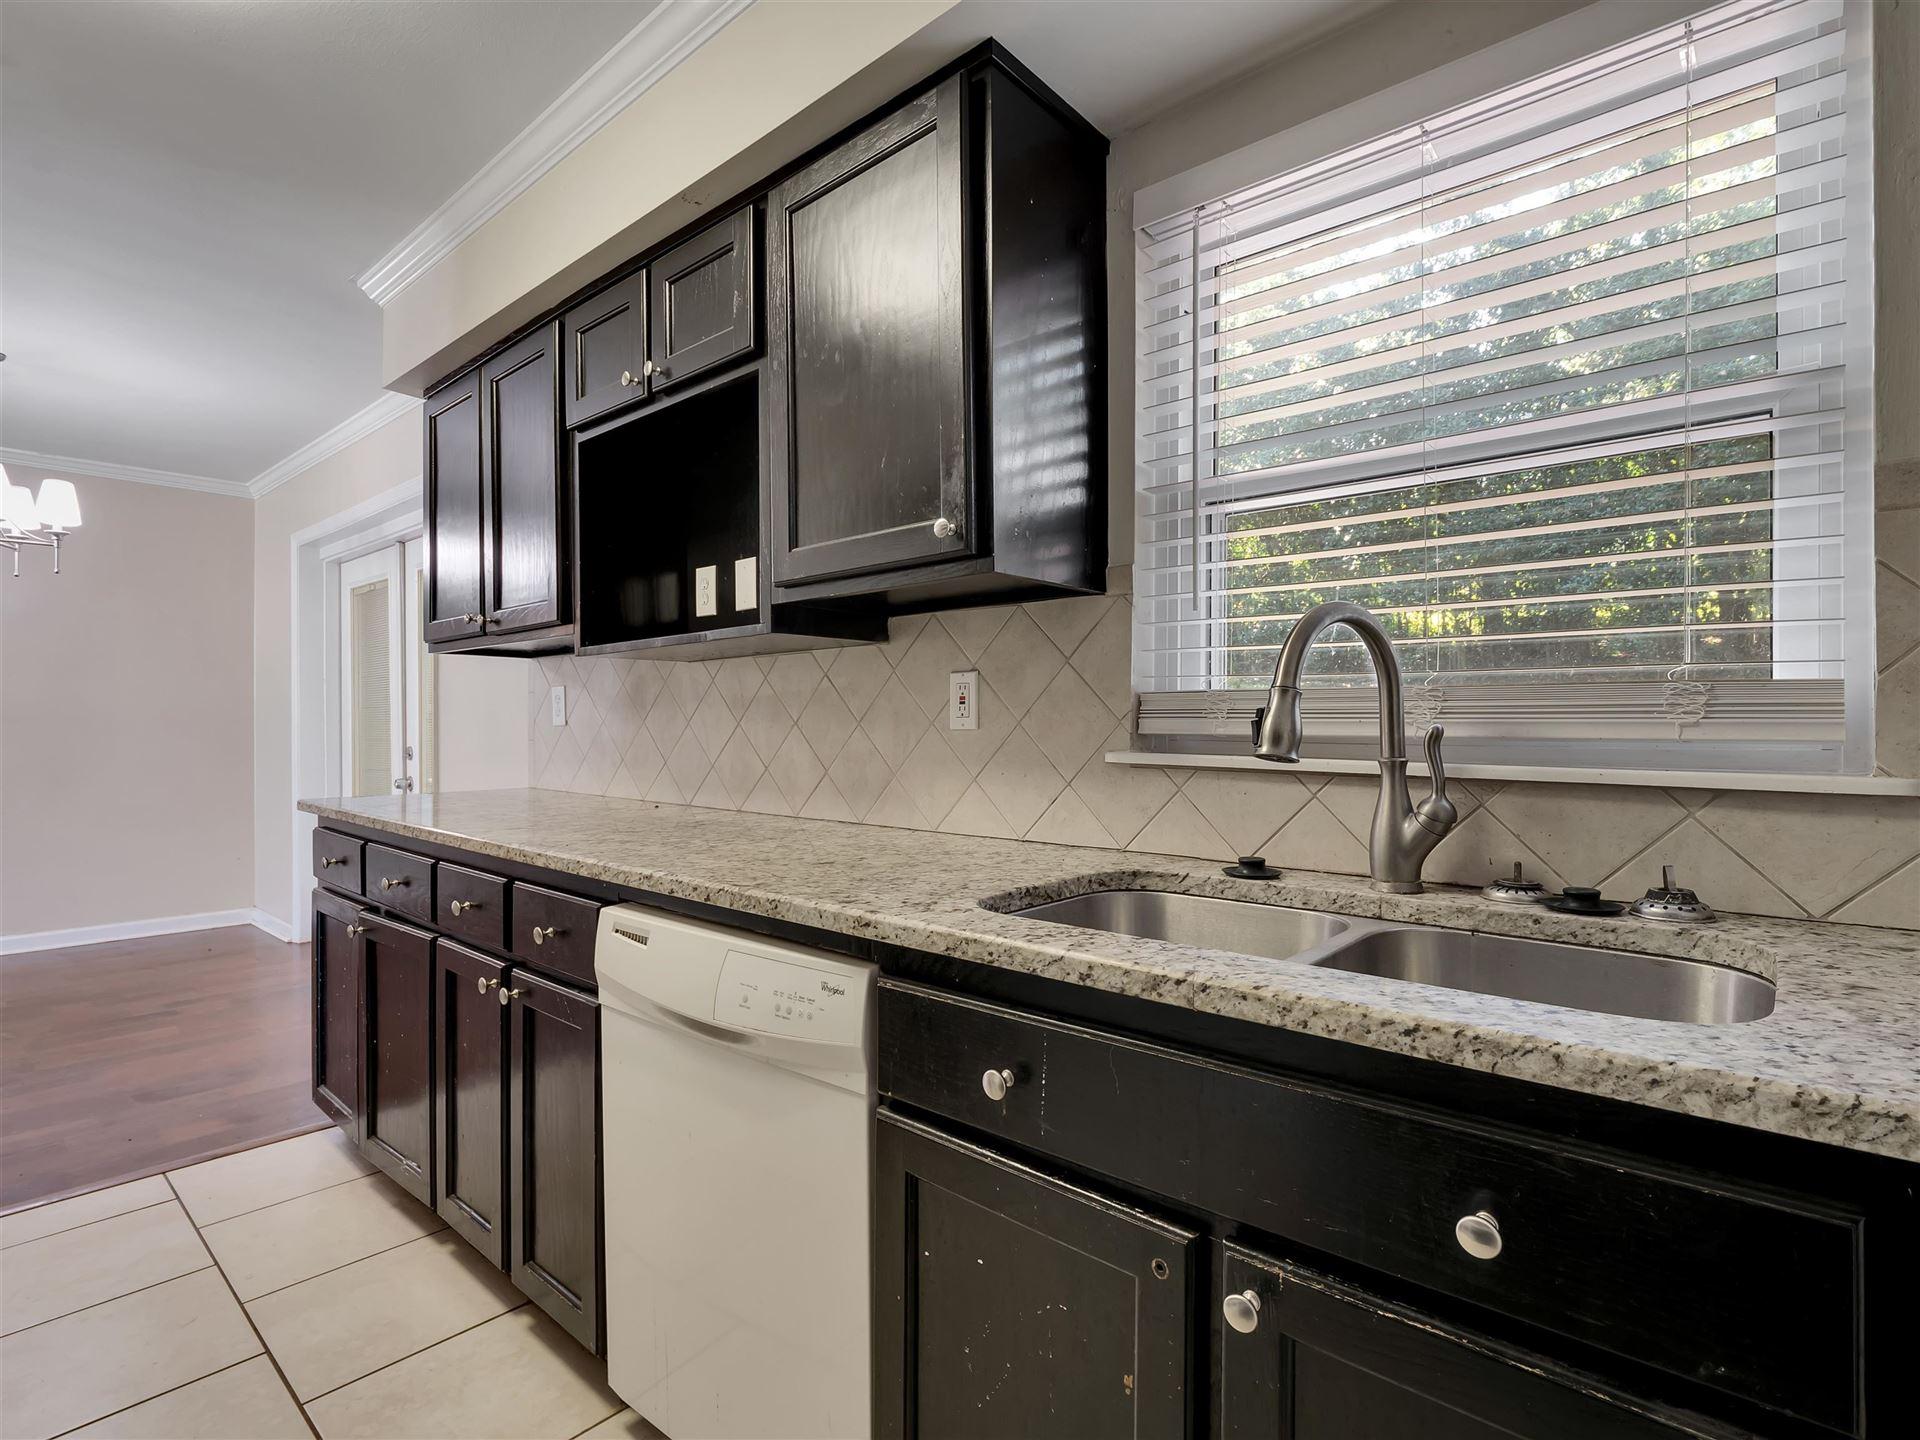 Photo of 1725 Belvedere Street, TALLAHASSEE, FL 32308 (MLS # 338254)